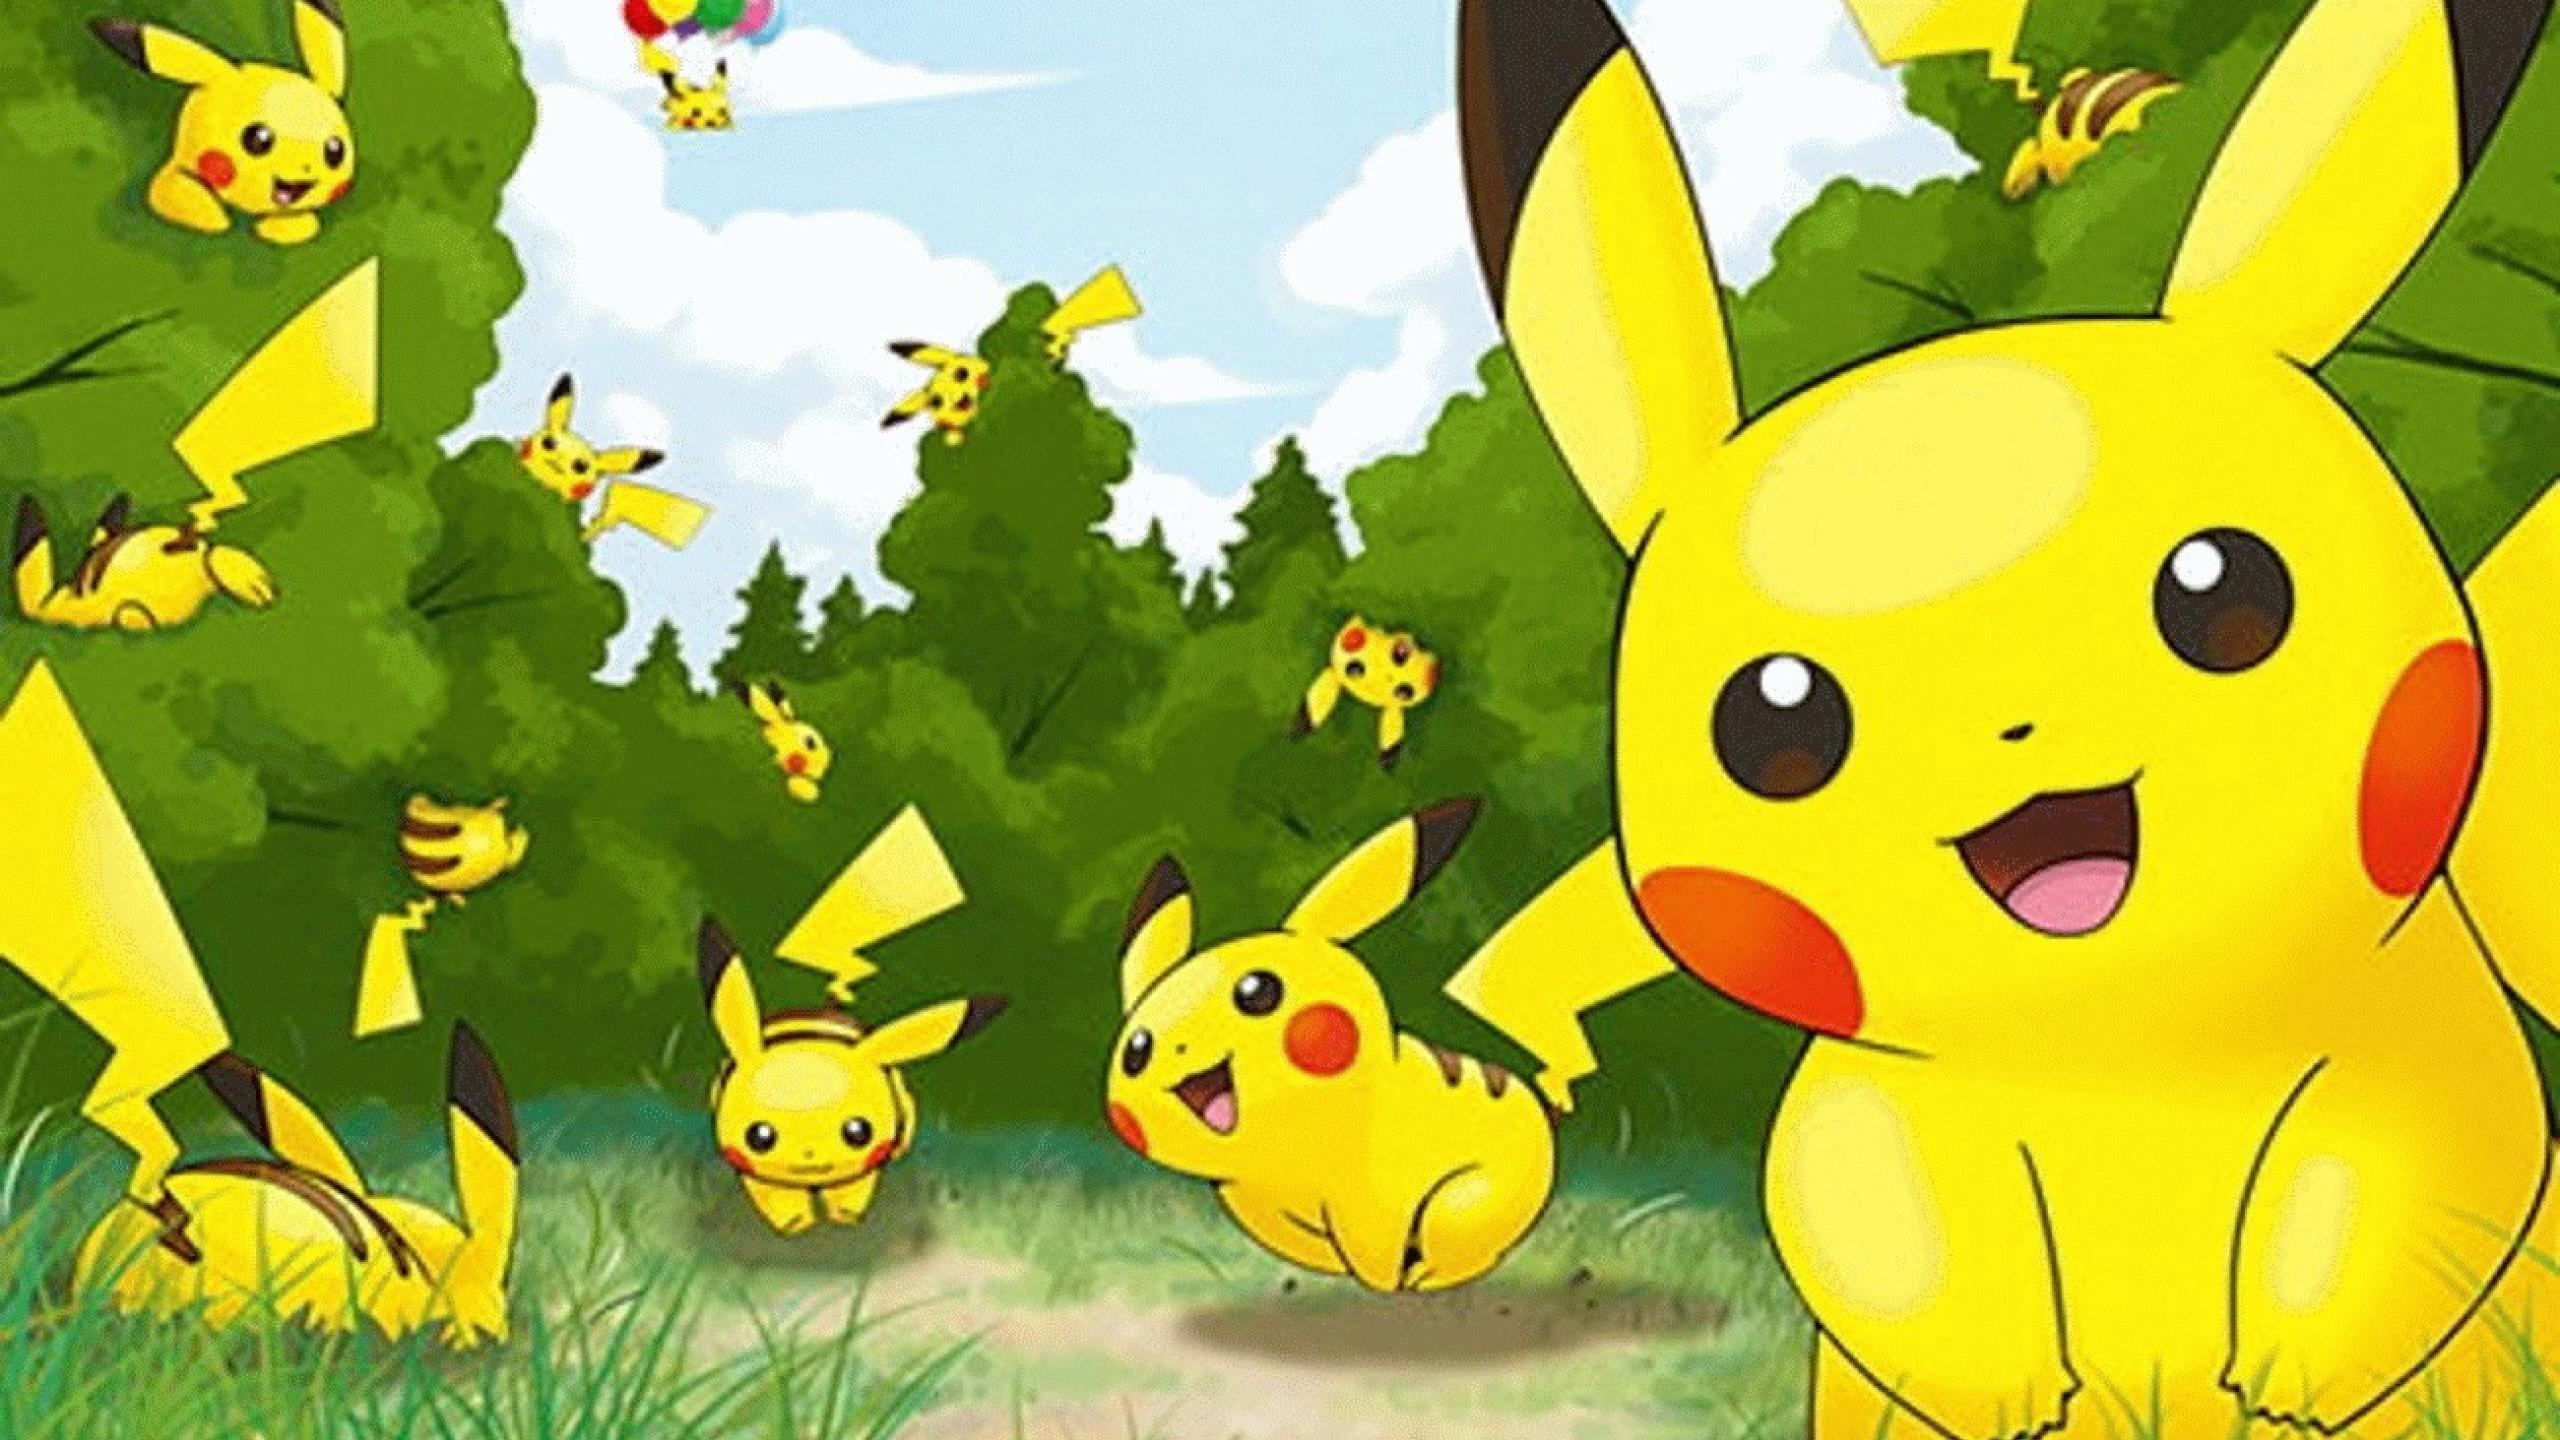 pokemon wallpaper hd pikachu id: 18095 / Source